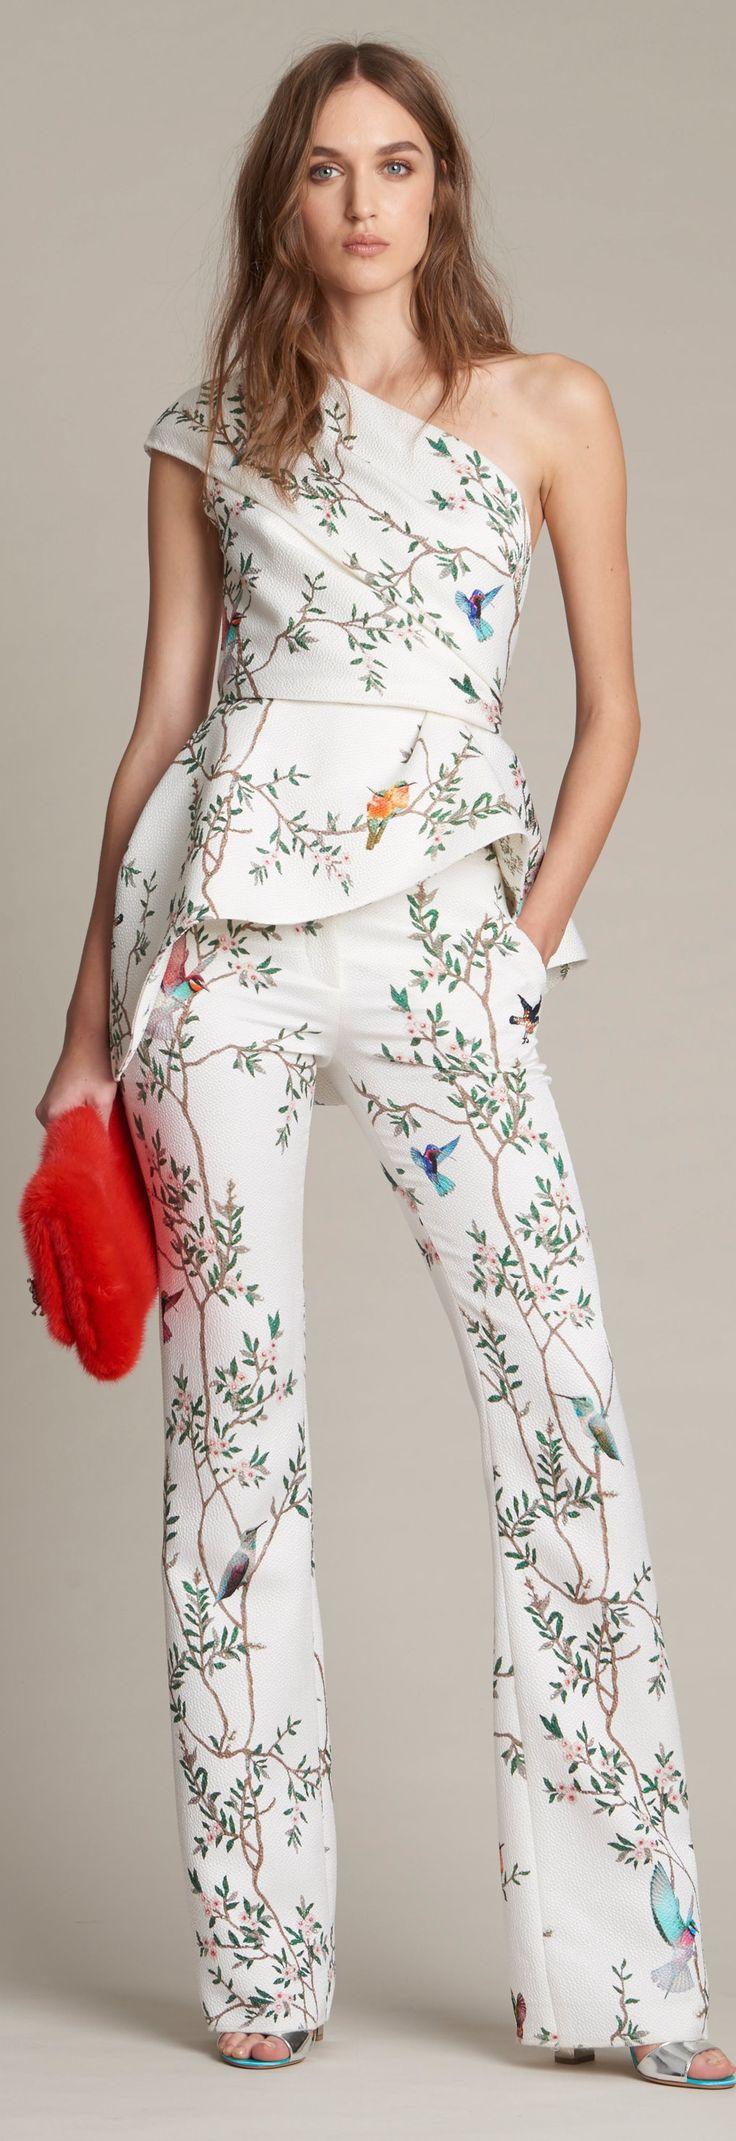 Monique Lhuillier Pre-Fall 2016 women fashion outfit clothing style apparel @roressclothes closet ideas